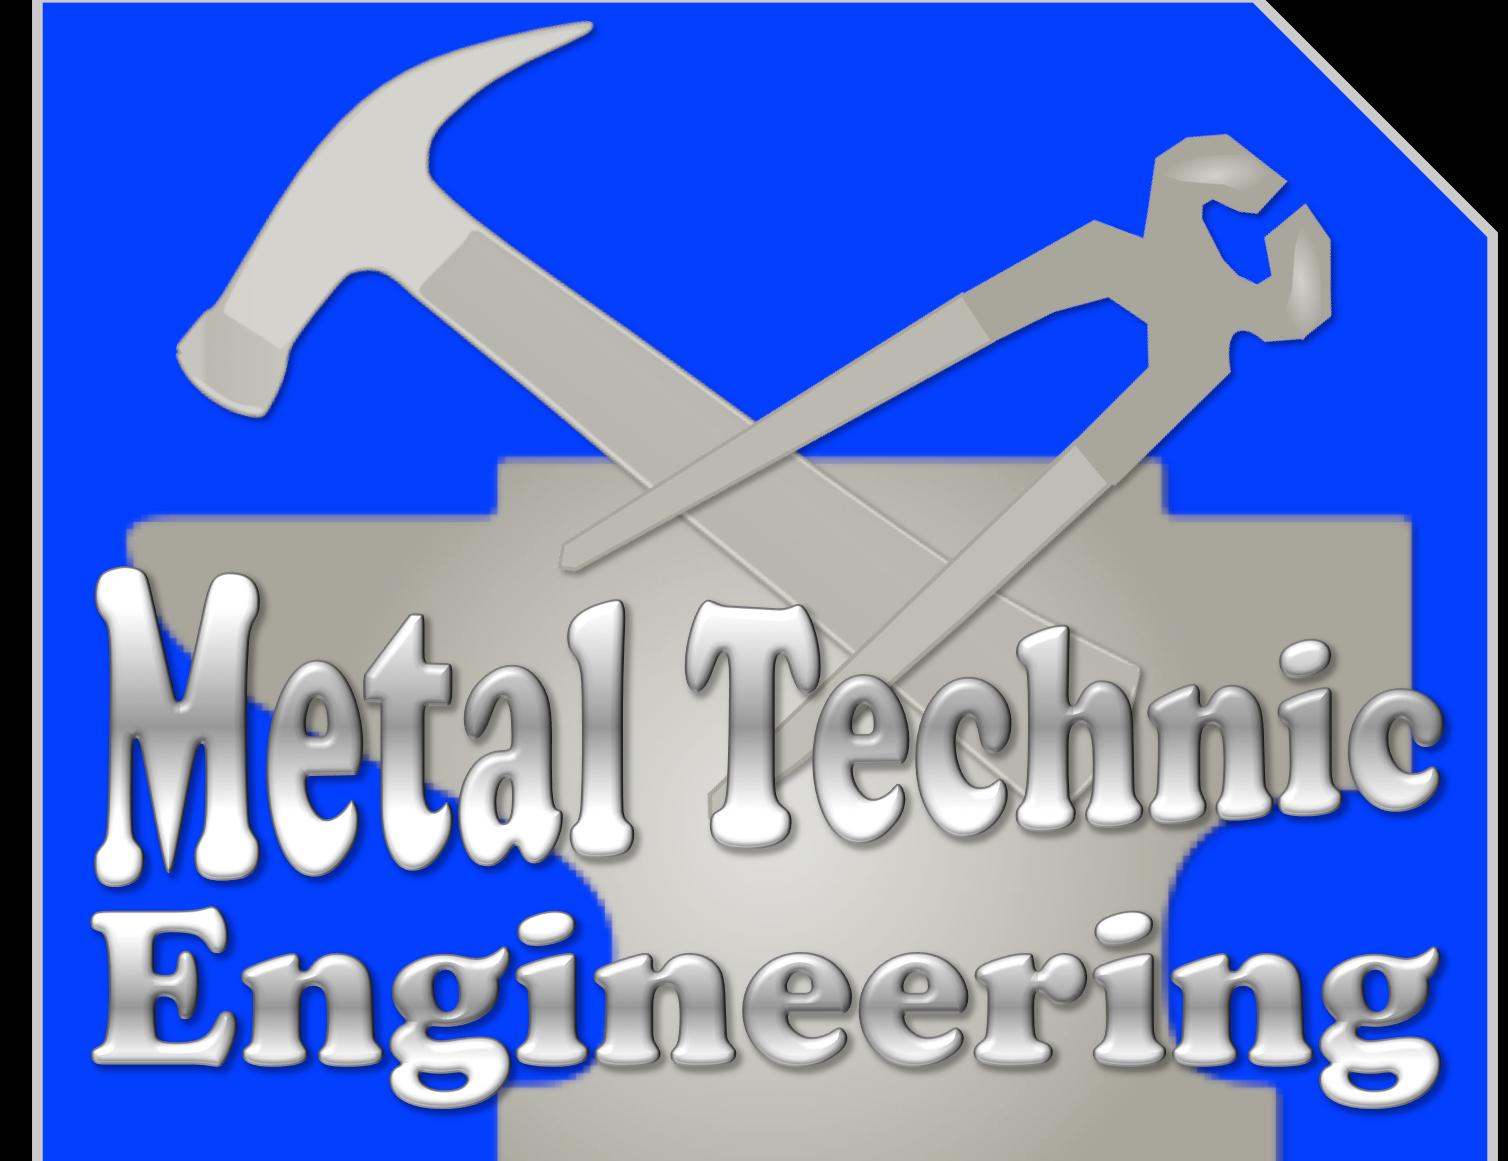 Metal Technic Engineering Limited